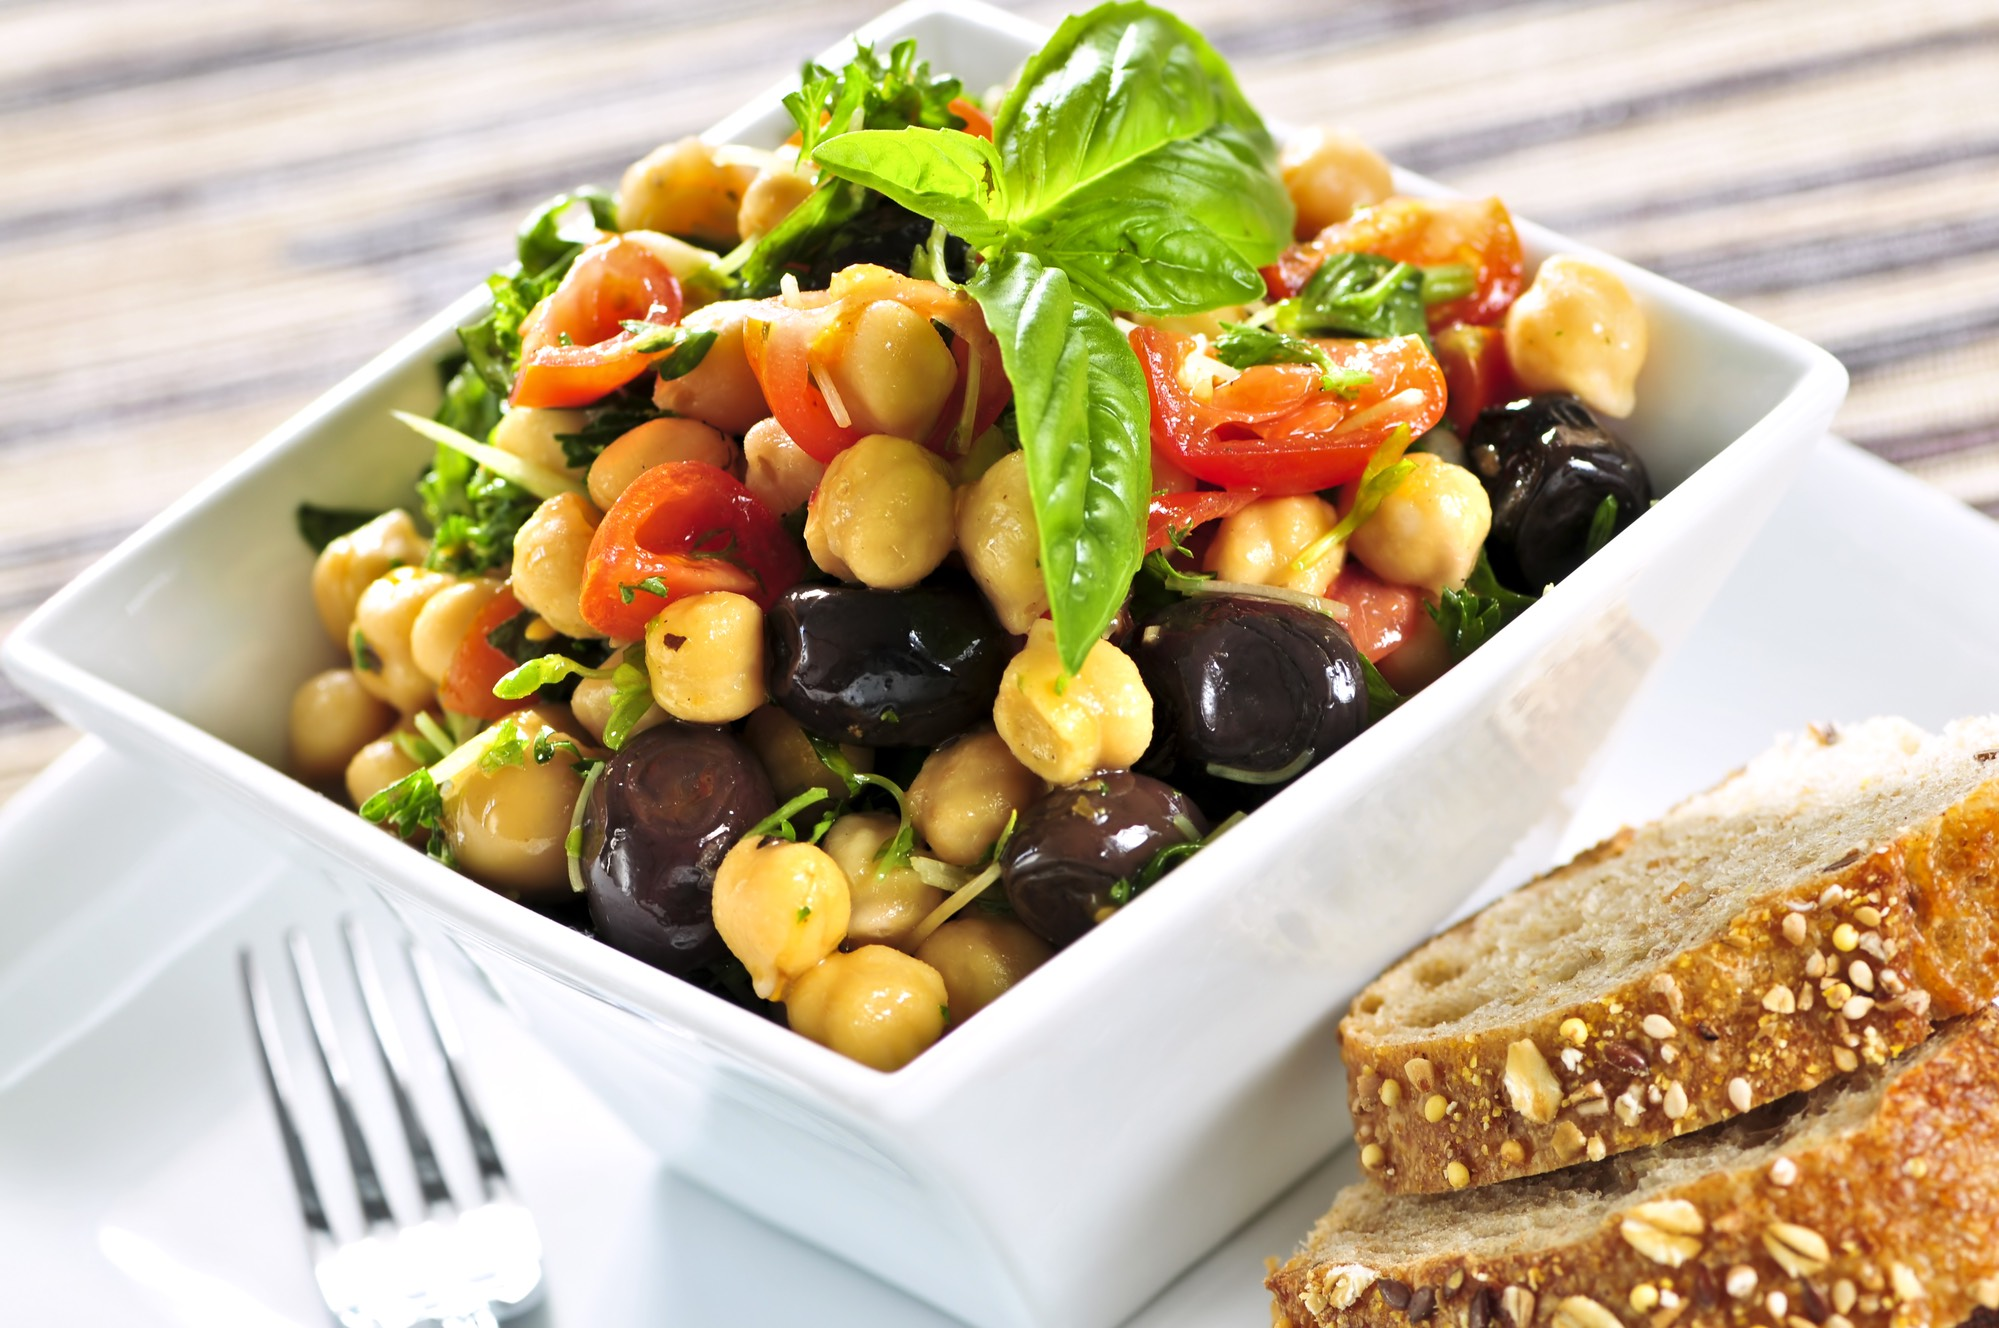 36 Vegetarian Restaurants in Singapore Sorted by Region (2020)